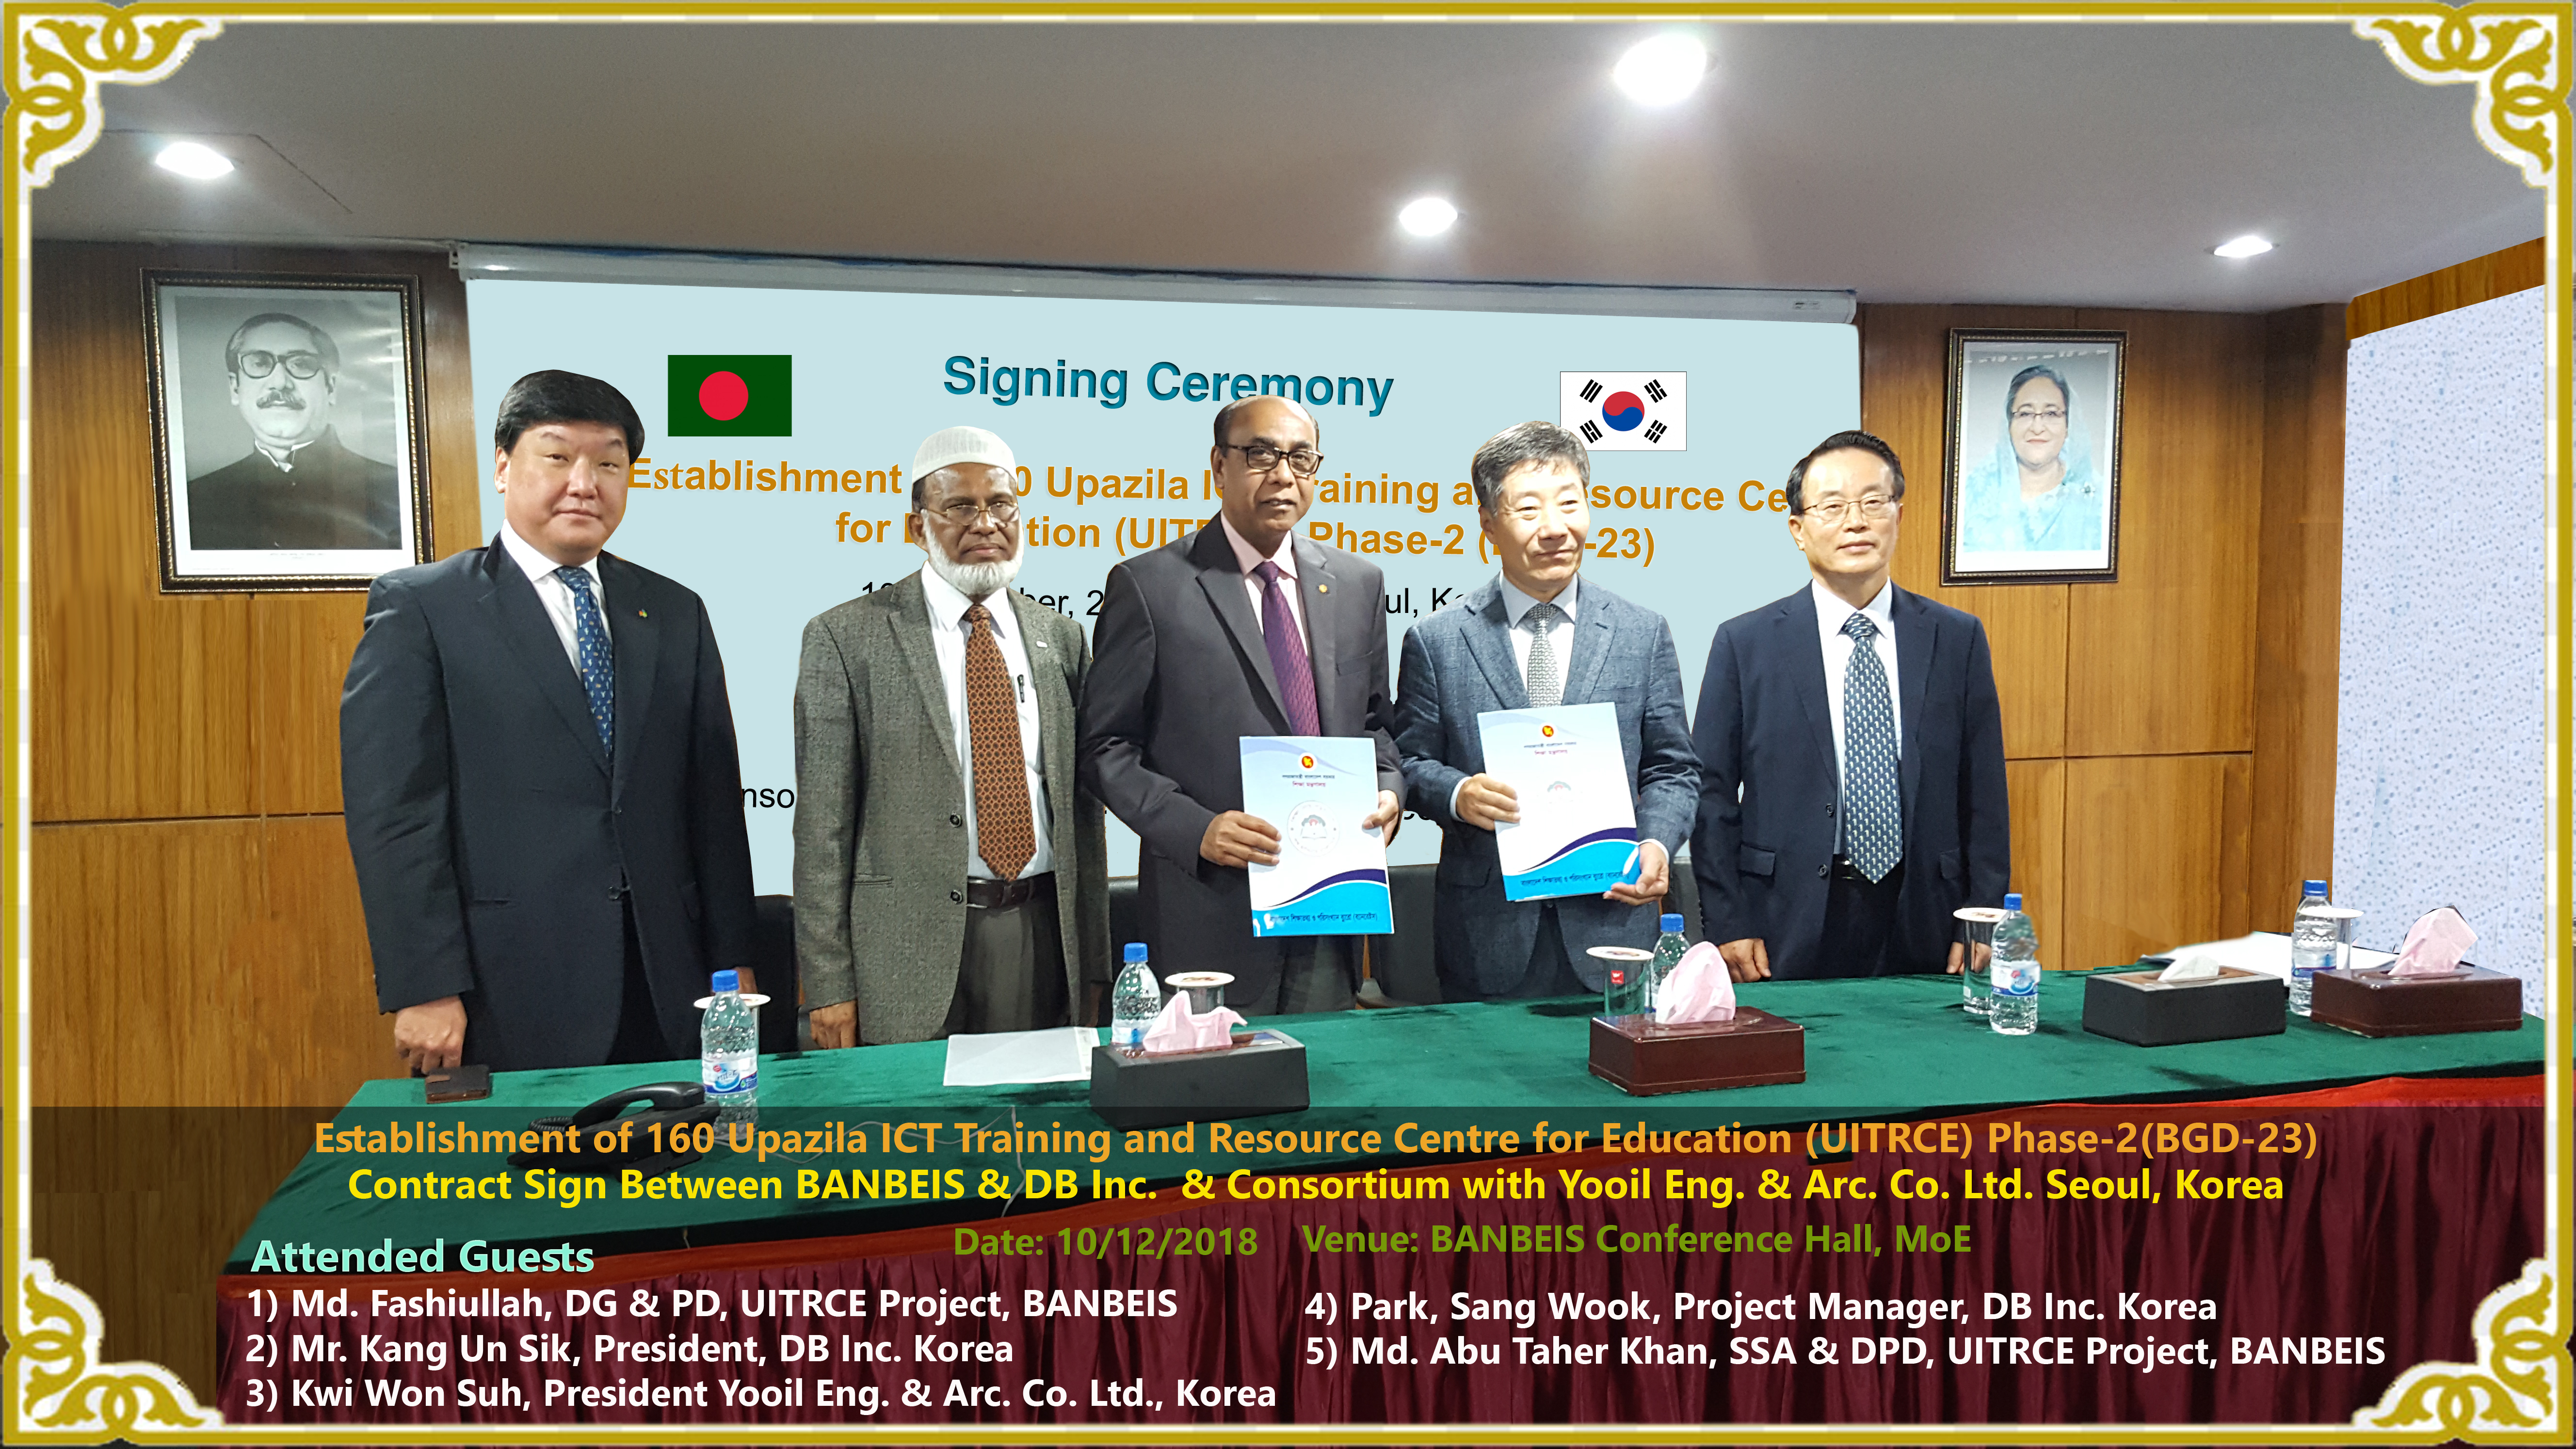 """Establishment of 160 Upazila ICT Training and Resource Centre for Education (UITRCE) Phase-II (BGD-23)"" প্রকল্পের কনসালটেন্ট চুক্তি স্বাক্ষর"